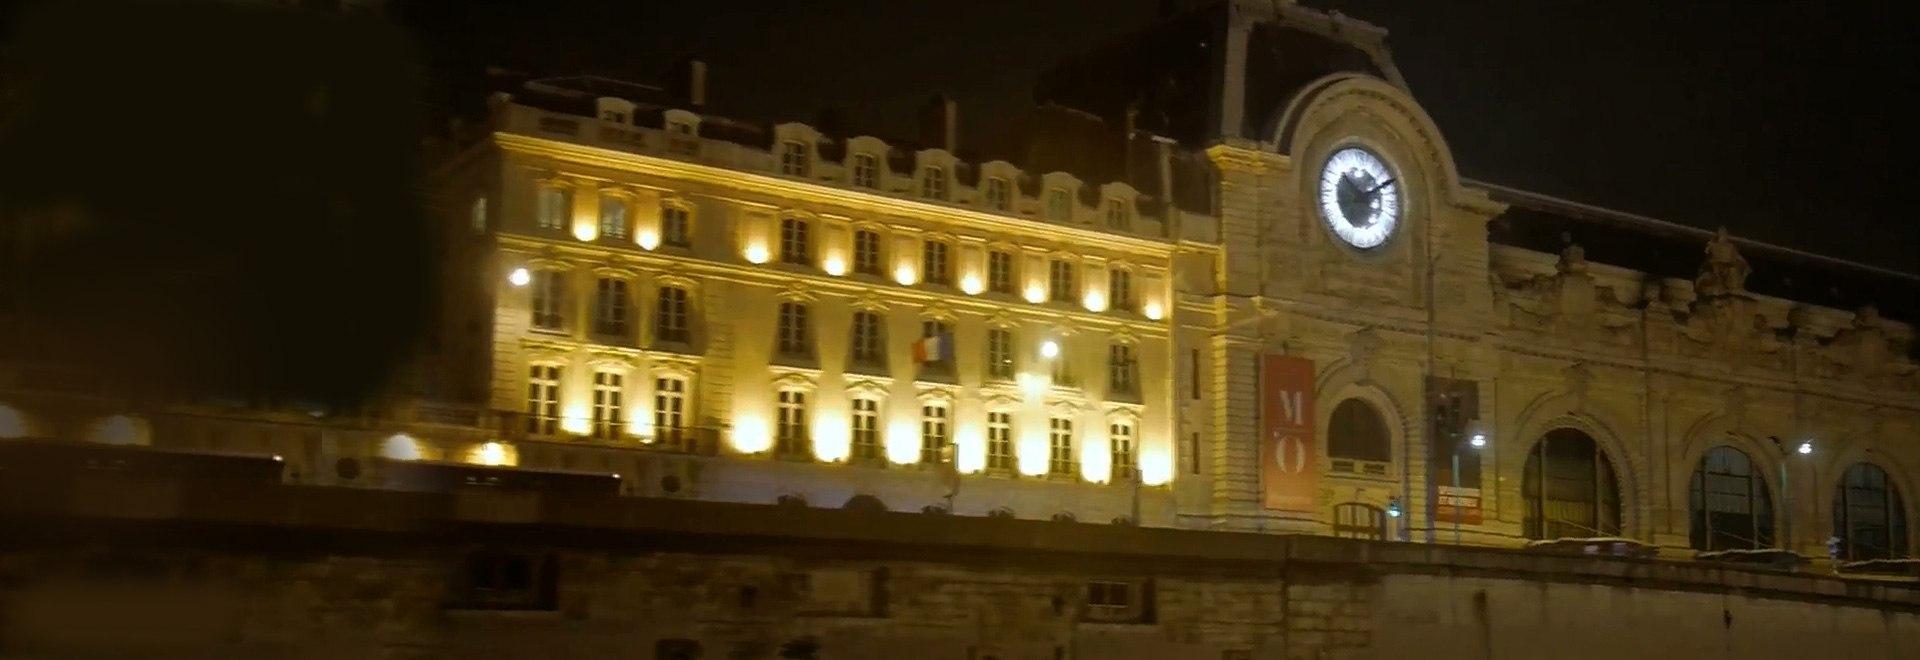 Una notte al museo d'Orsay